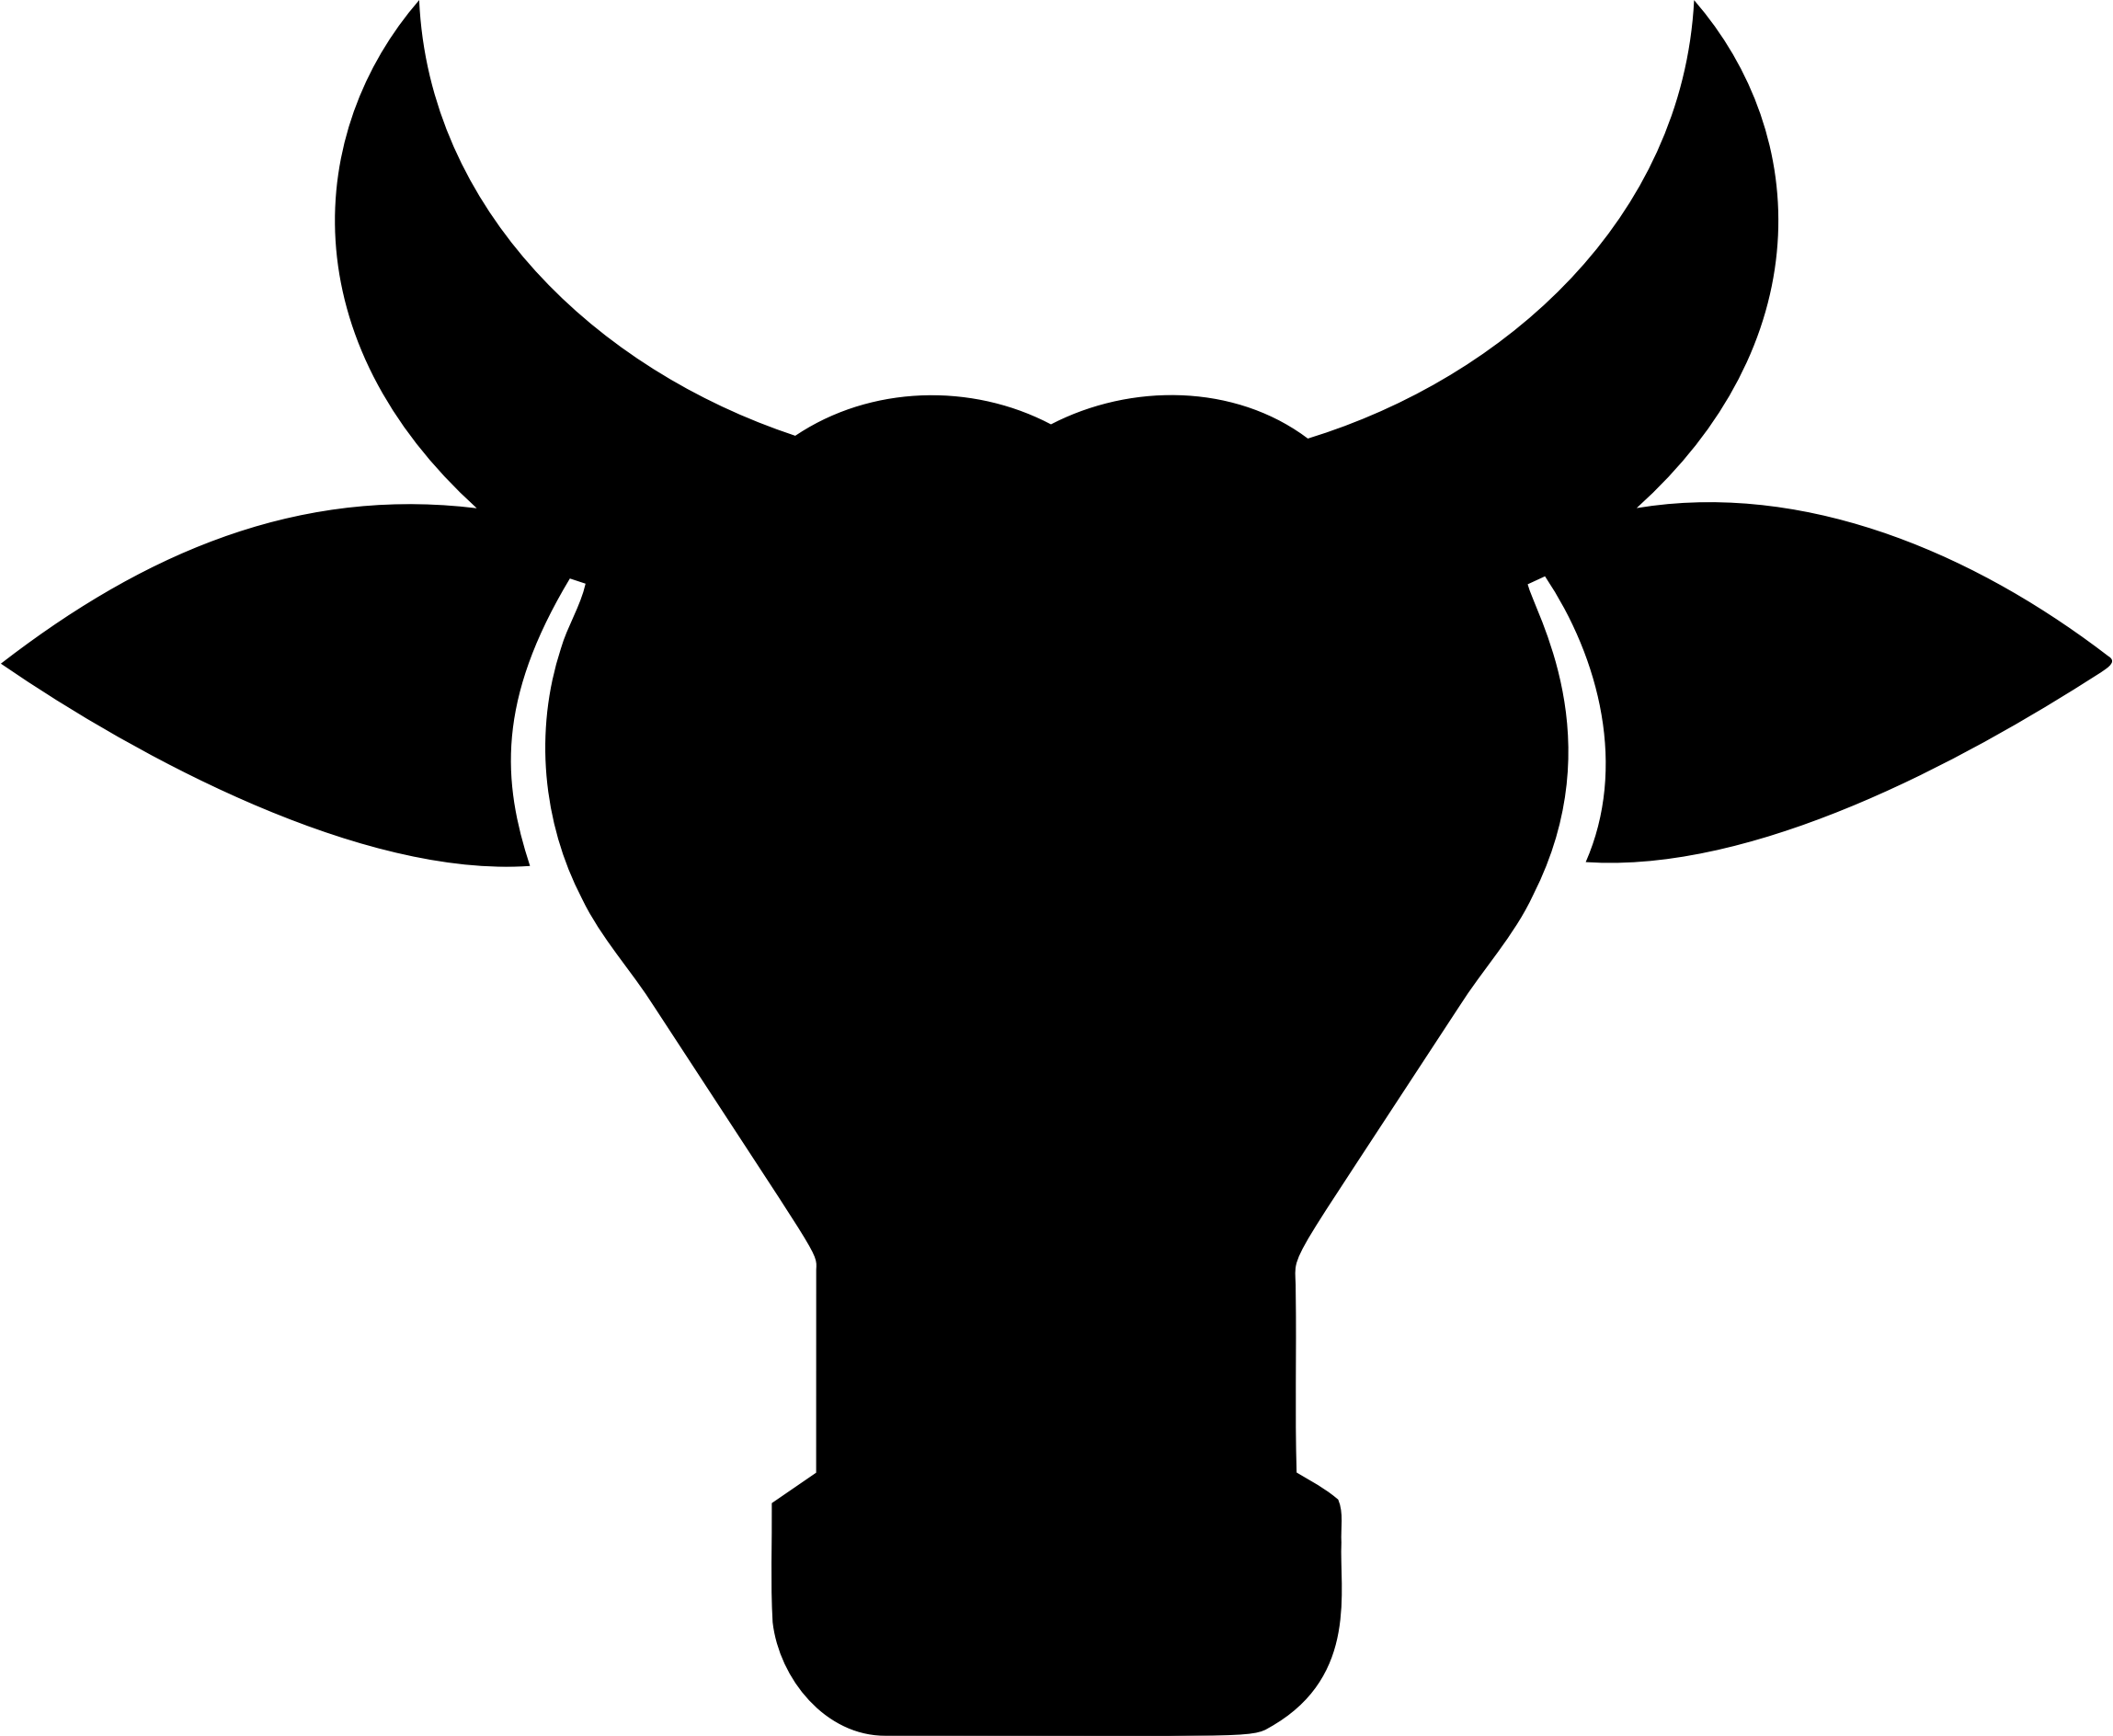 2298x1888 Clipart